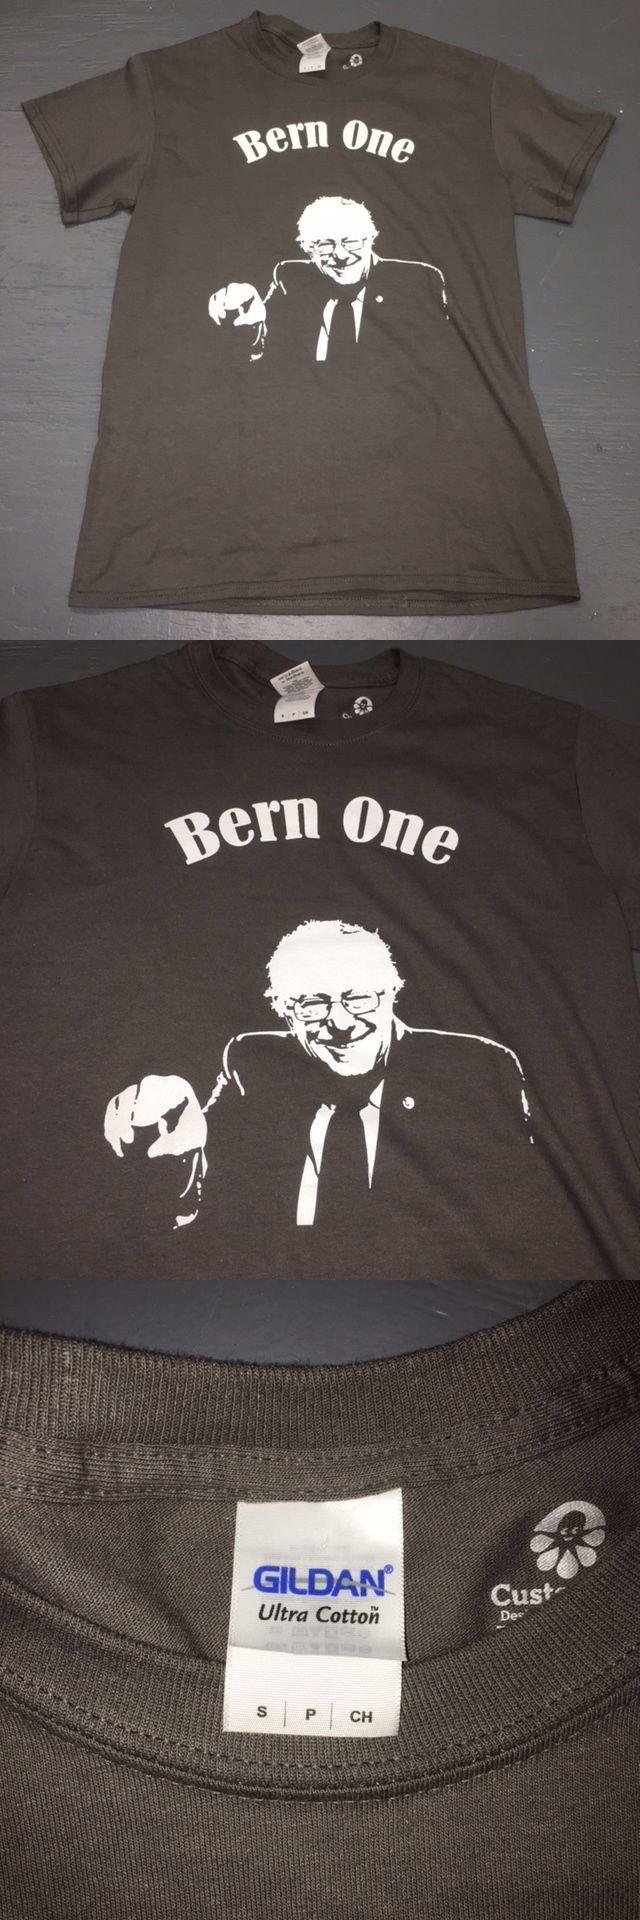 Bernie Sanders: Bernie Sanders Bern One 2016 Presidential Campaign T Shirt Democrat Mens Small -> BUY IT NOW ONLY: $2.99 on eBay!